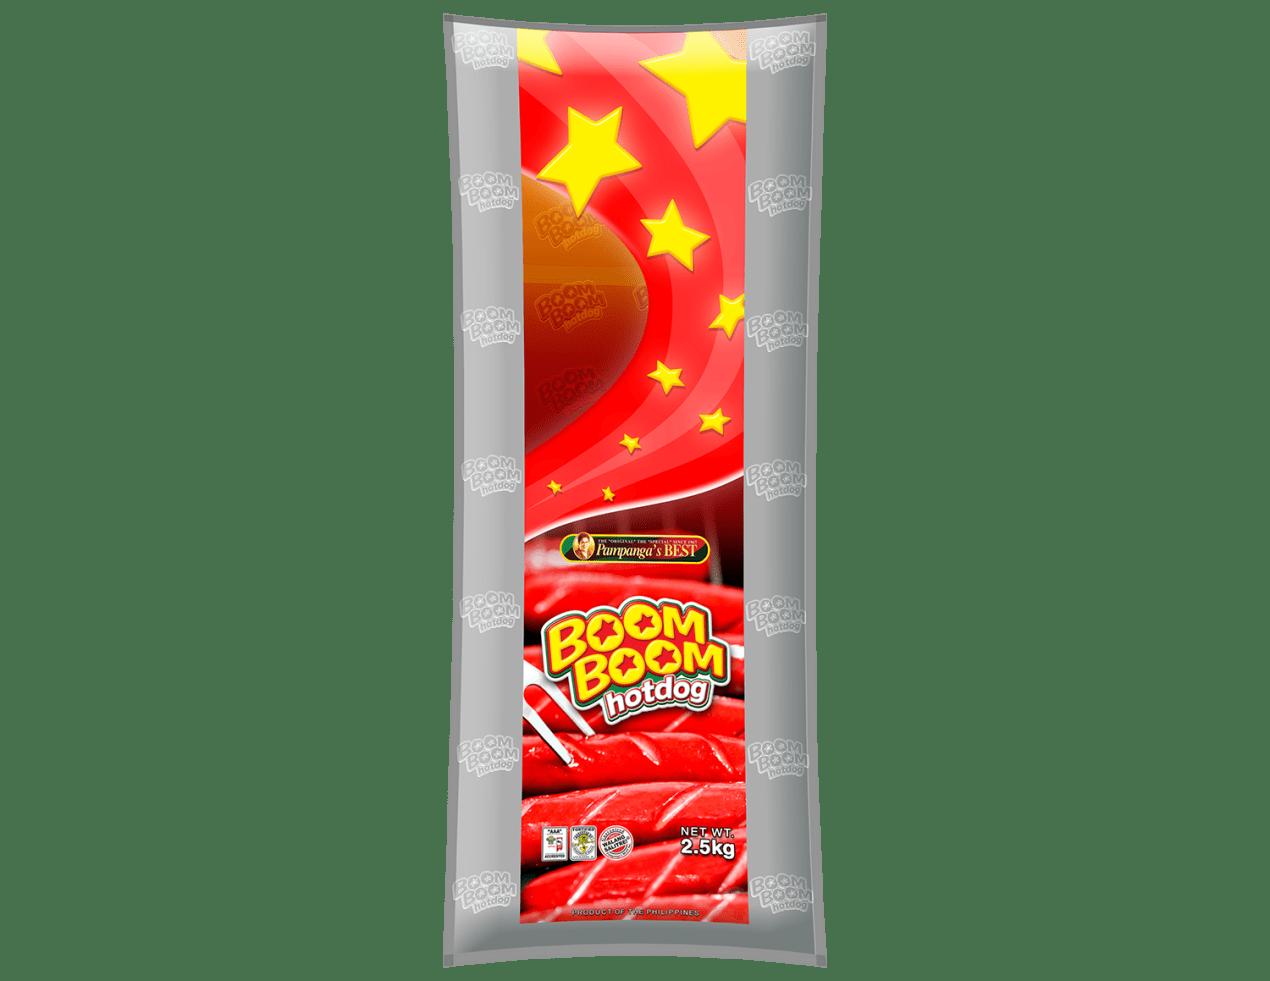 Boom Boom Hotdog 2.5Kg